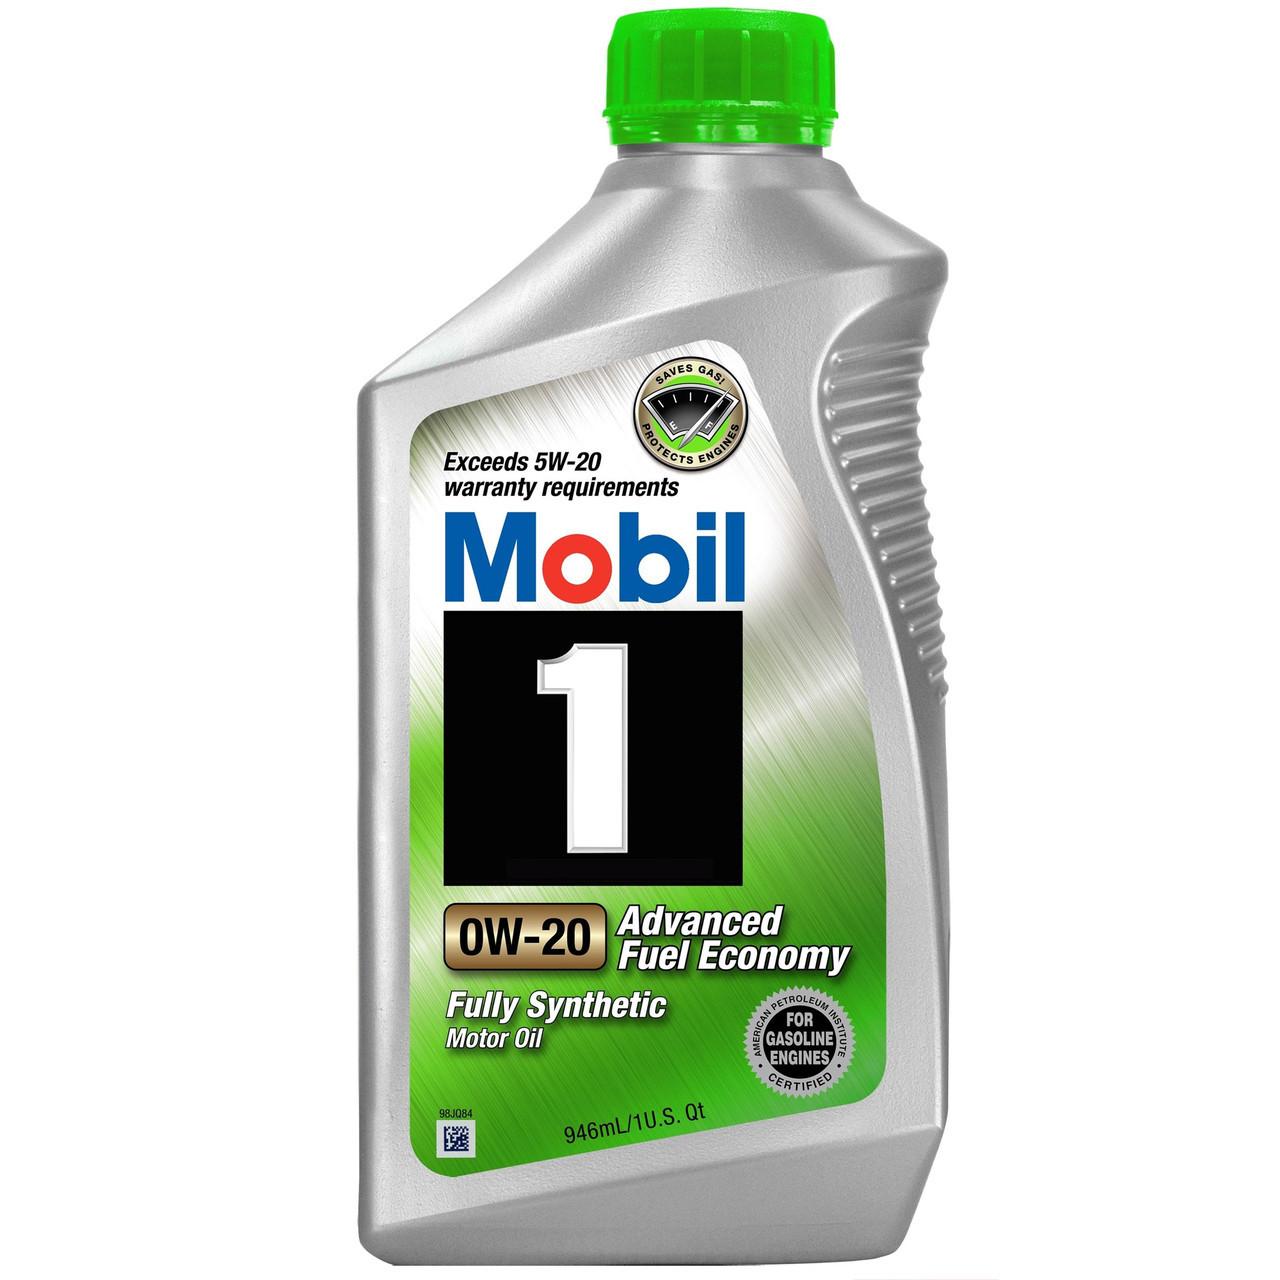 Моторное масло MOBIL Mobil 1 Advanced Fuel Economy 0W-20 0.946л